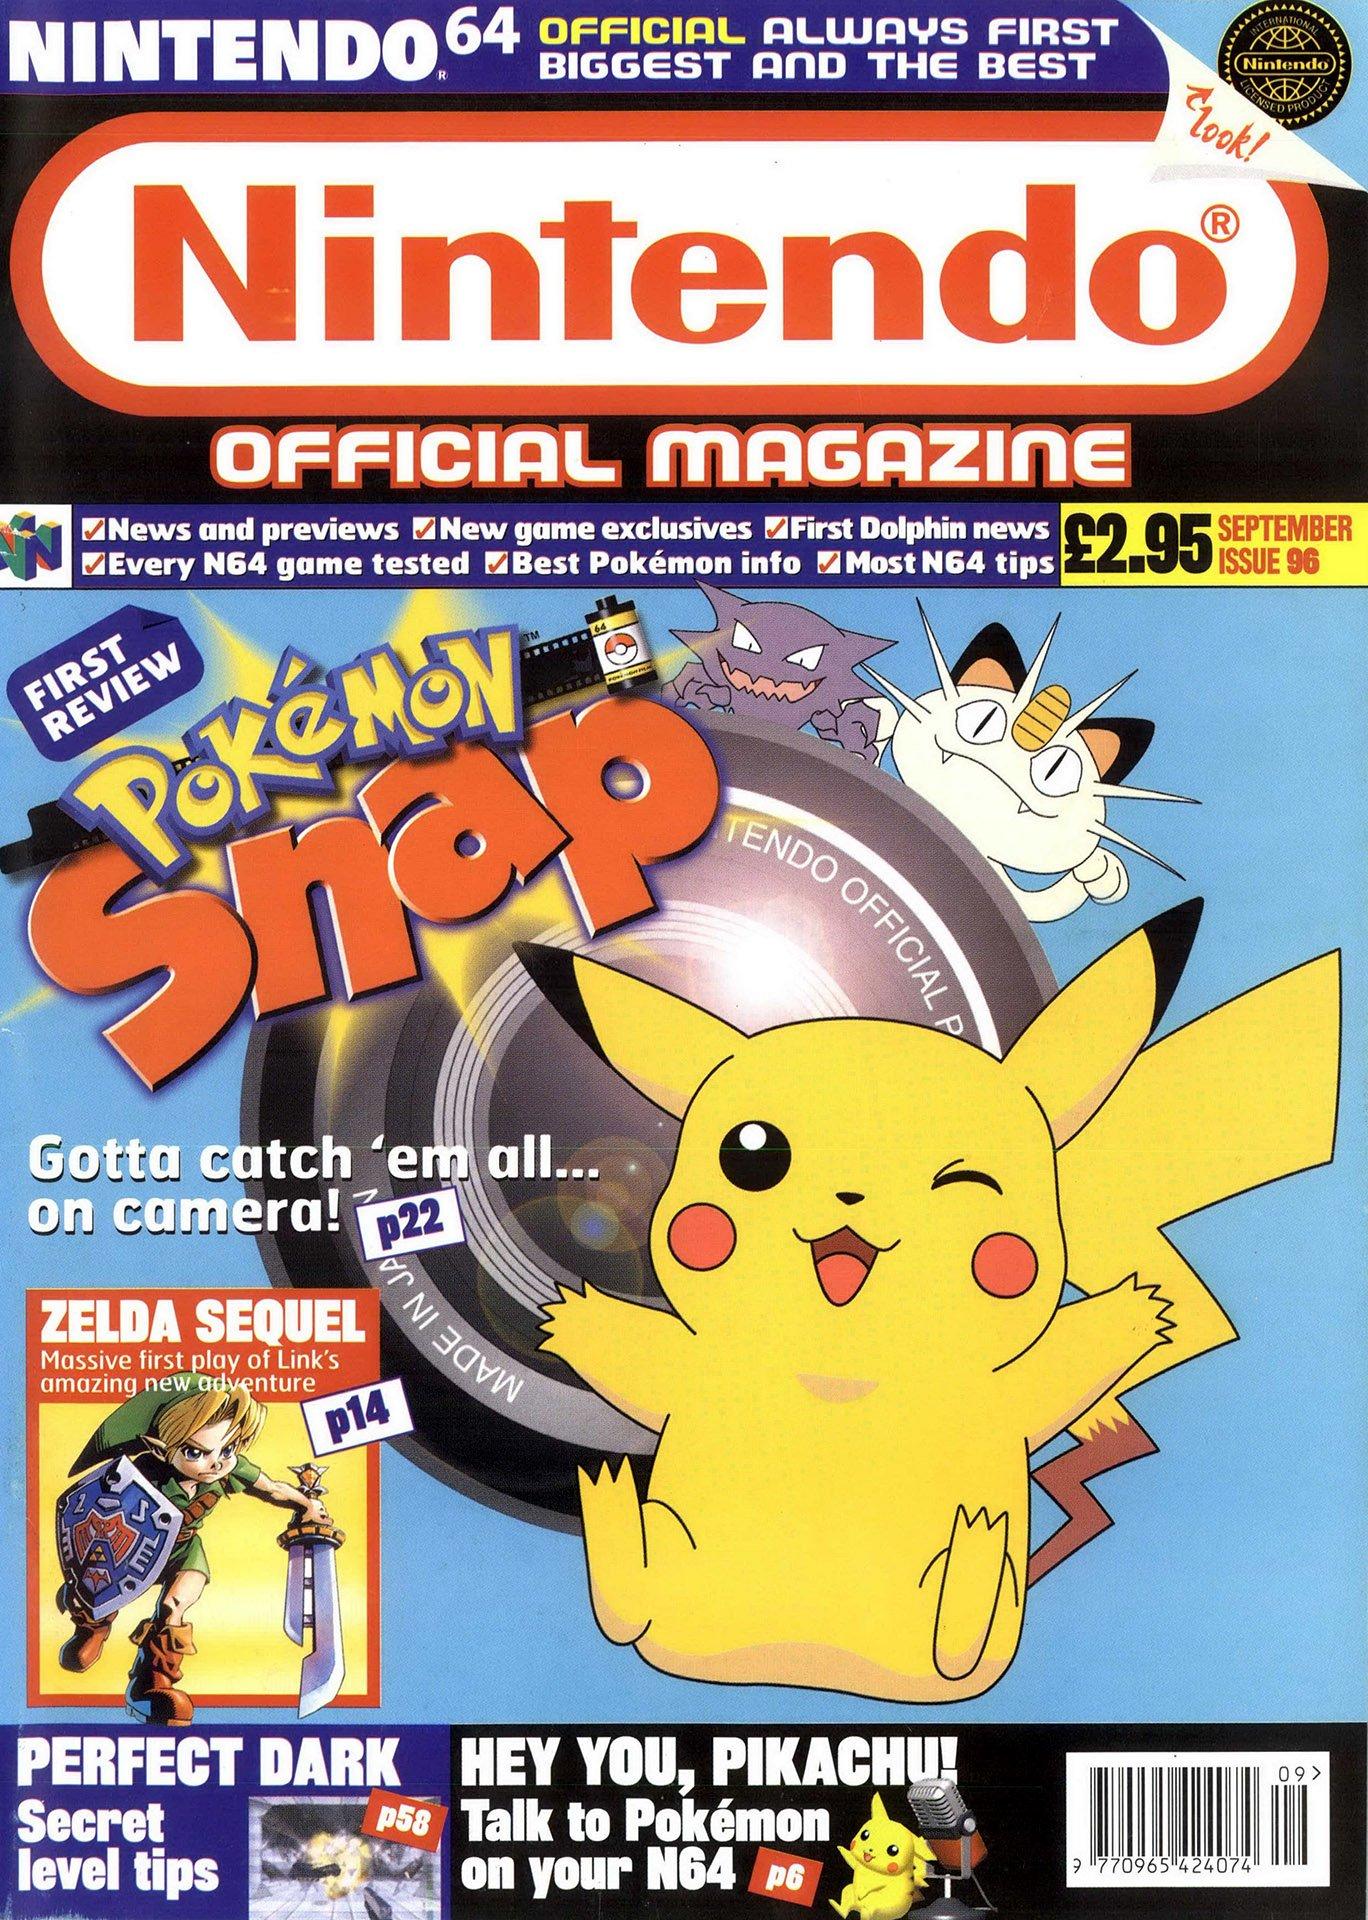 Nintendo Official Magazine 096 (September 2000)